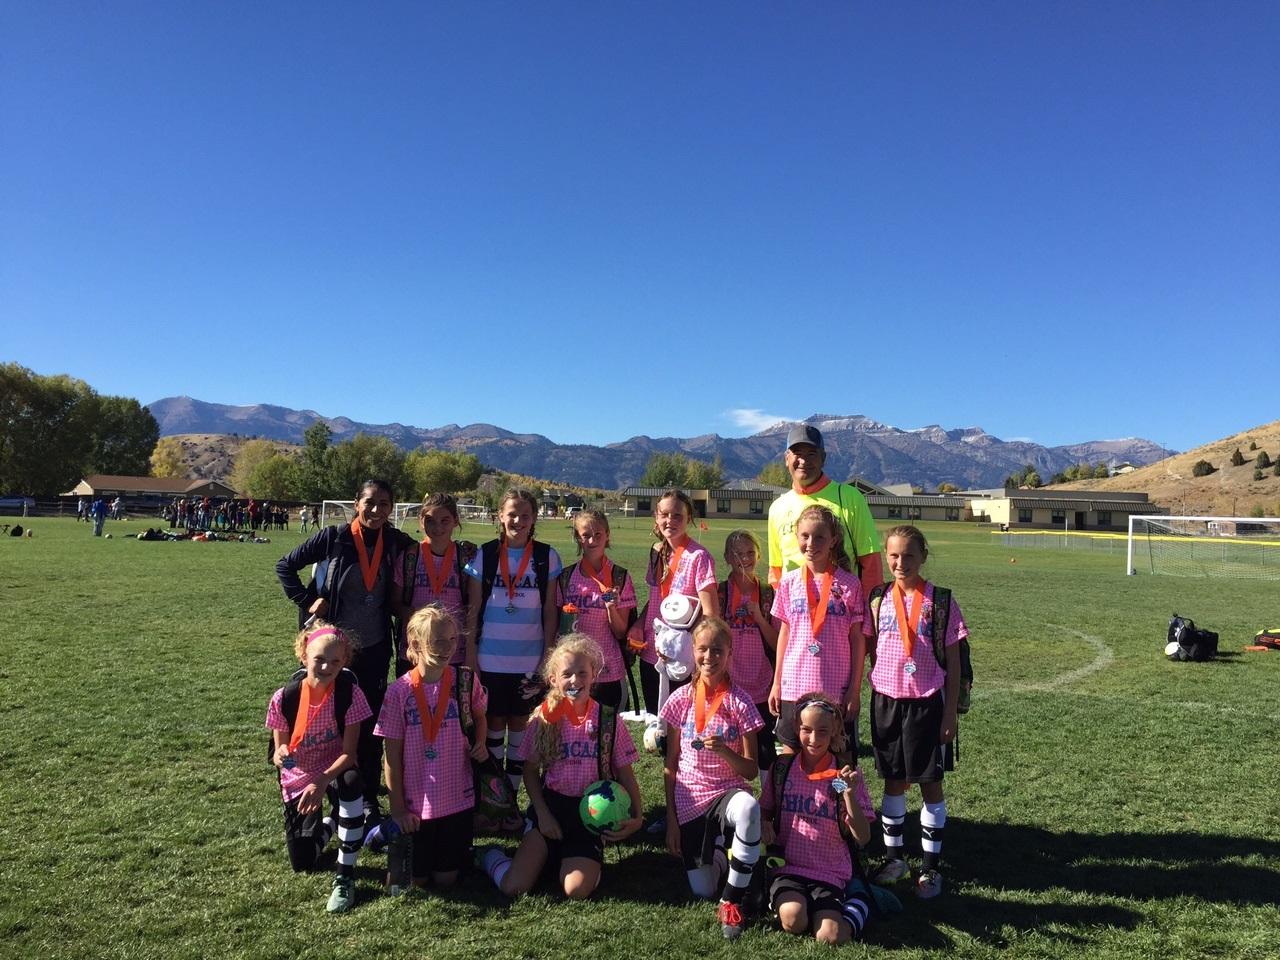 U12 Chicas Cyan, Jackson Hole Finalists Coaches Jessica Ayala and Jim Peters